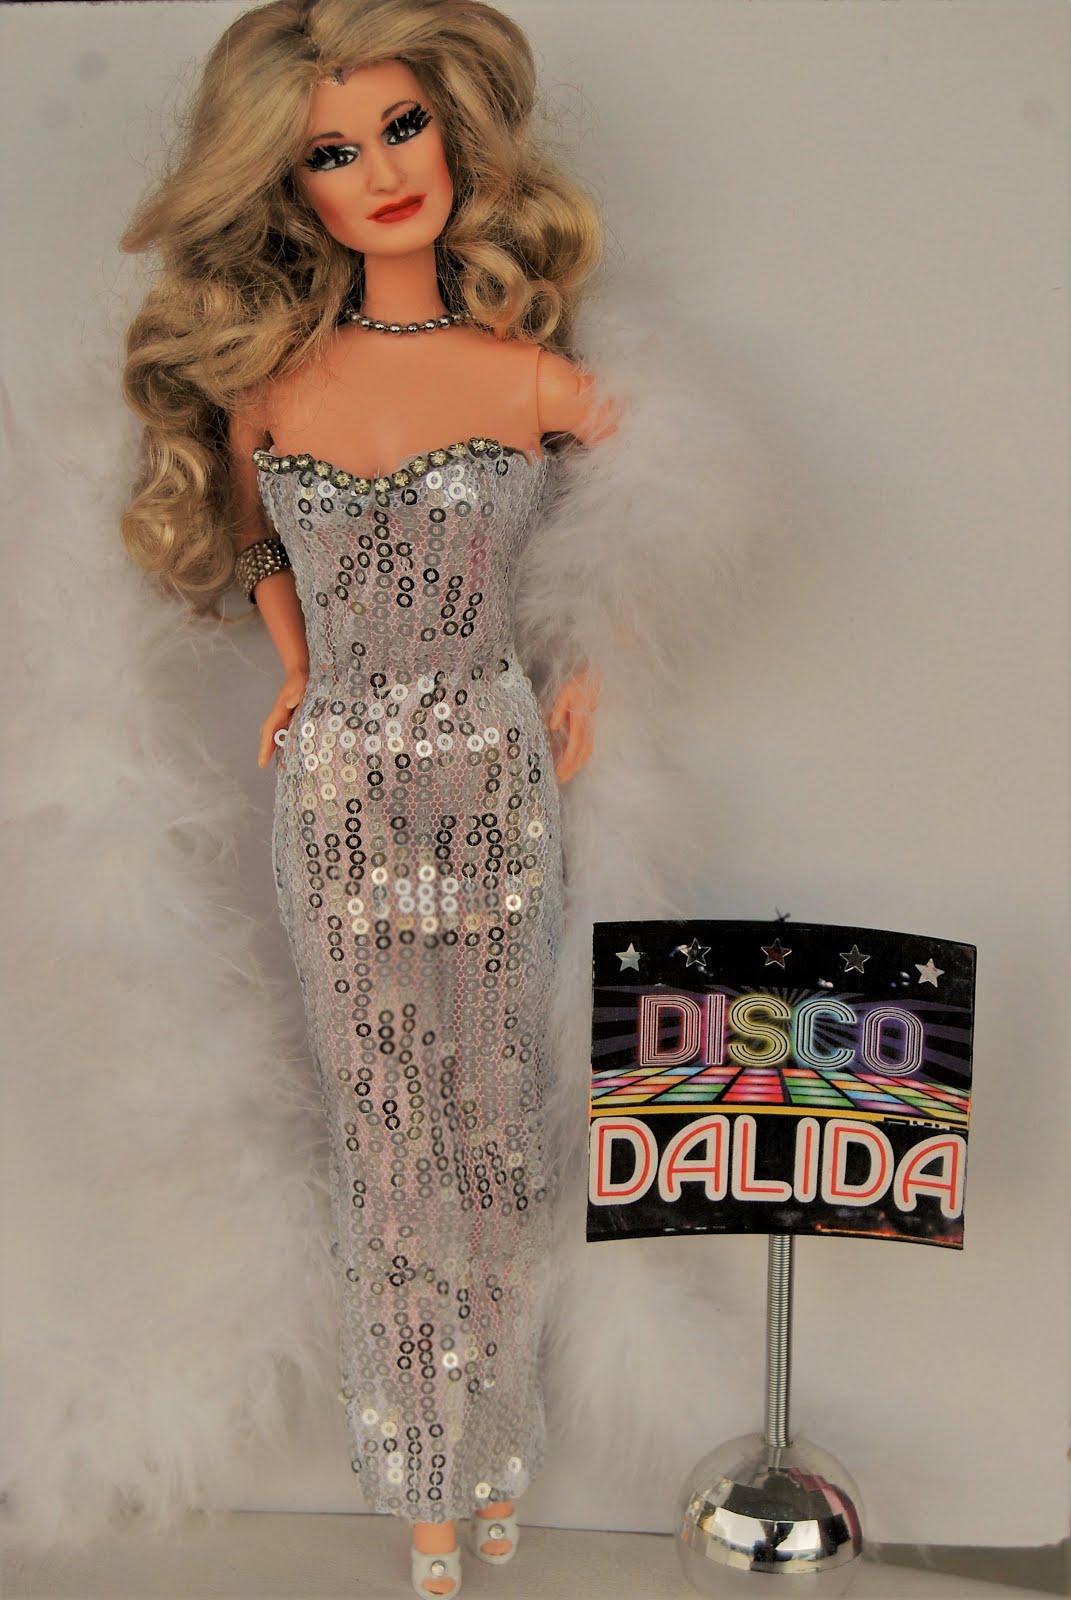 Dalida la poupée Disco : la vidéo sur Youtube